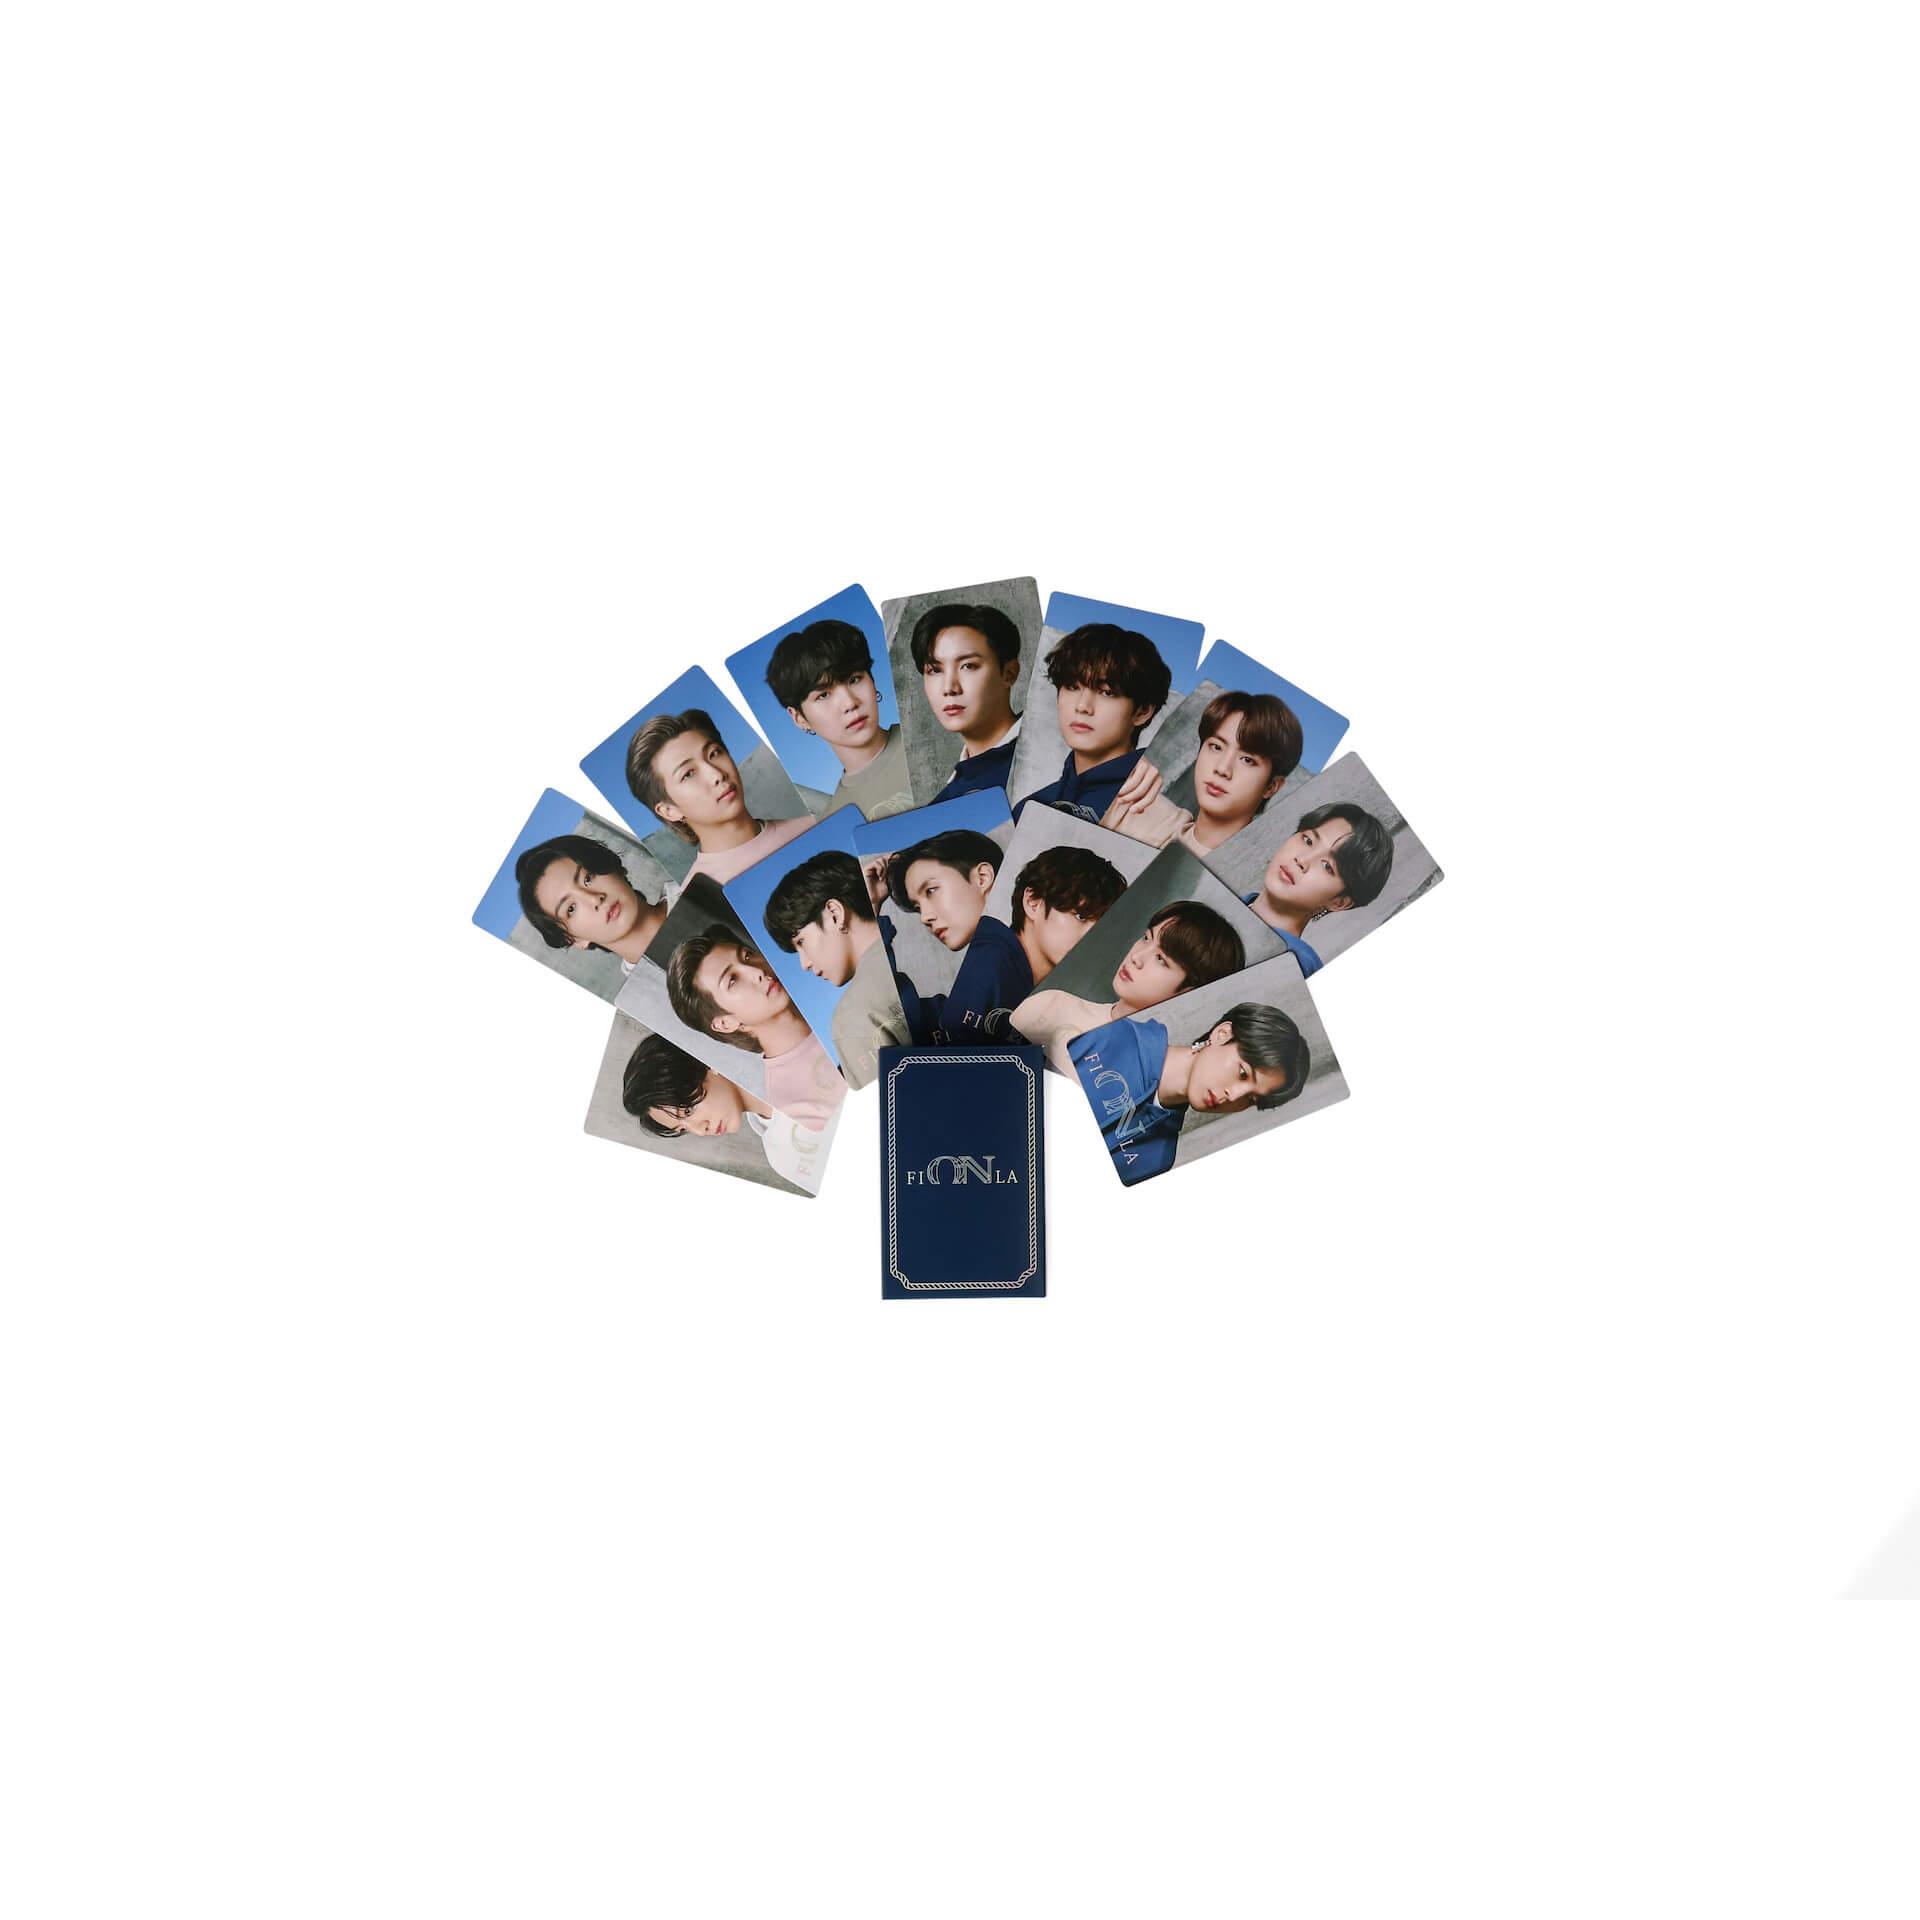 FILA × BTSの新コラボコレクション「Now ON」が今週先行予約販売開始!コラボ初のメンバー着用ビジュアルが解禁 life210621_fila_bts_6